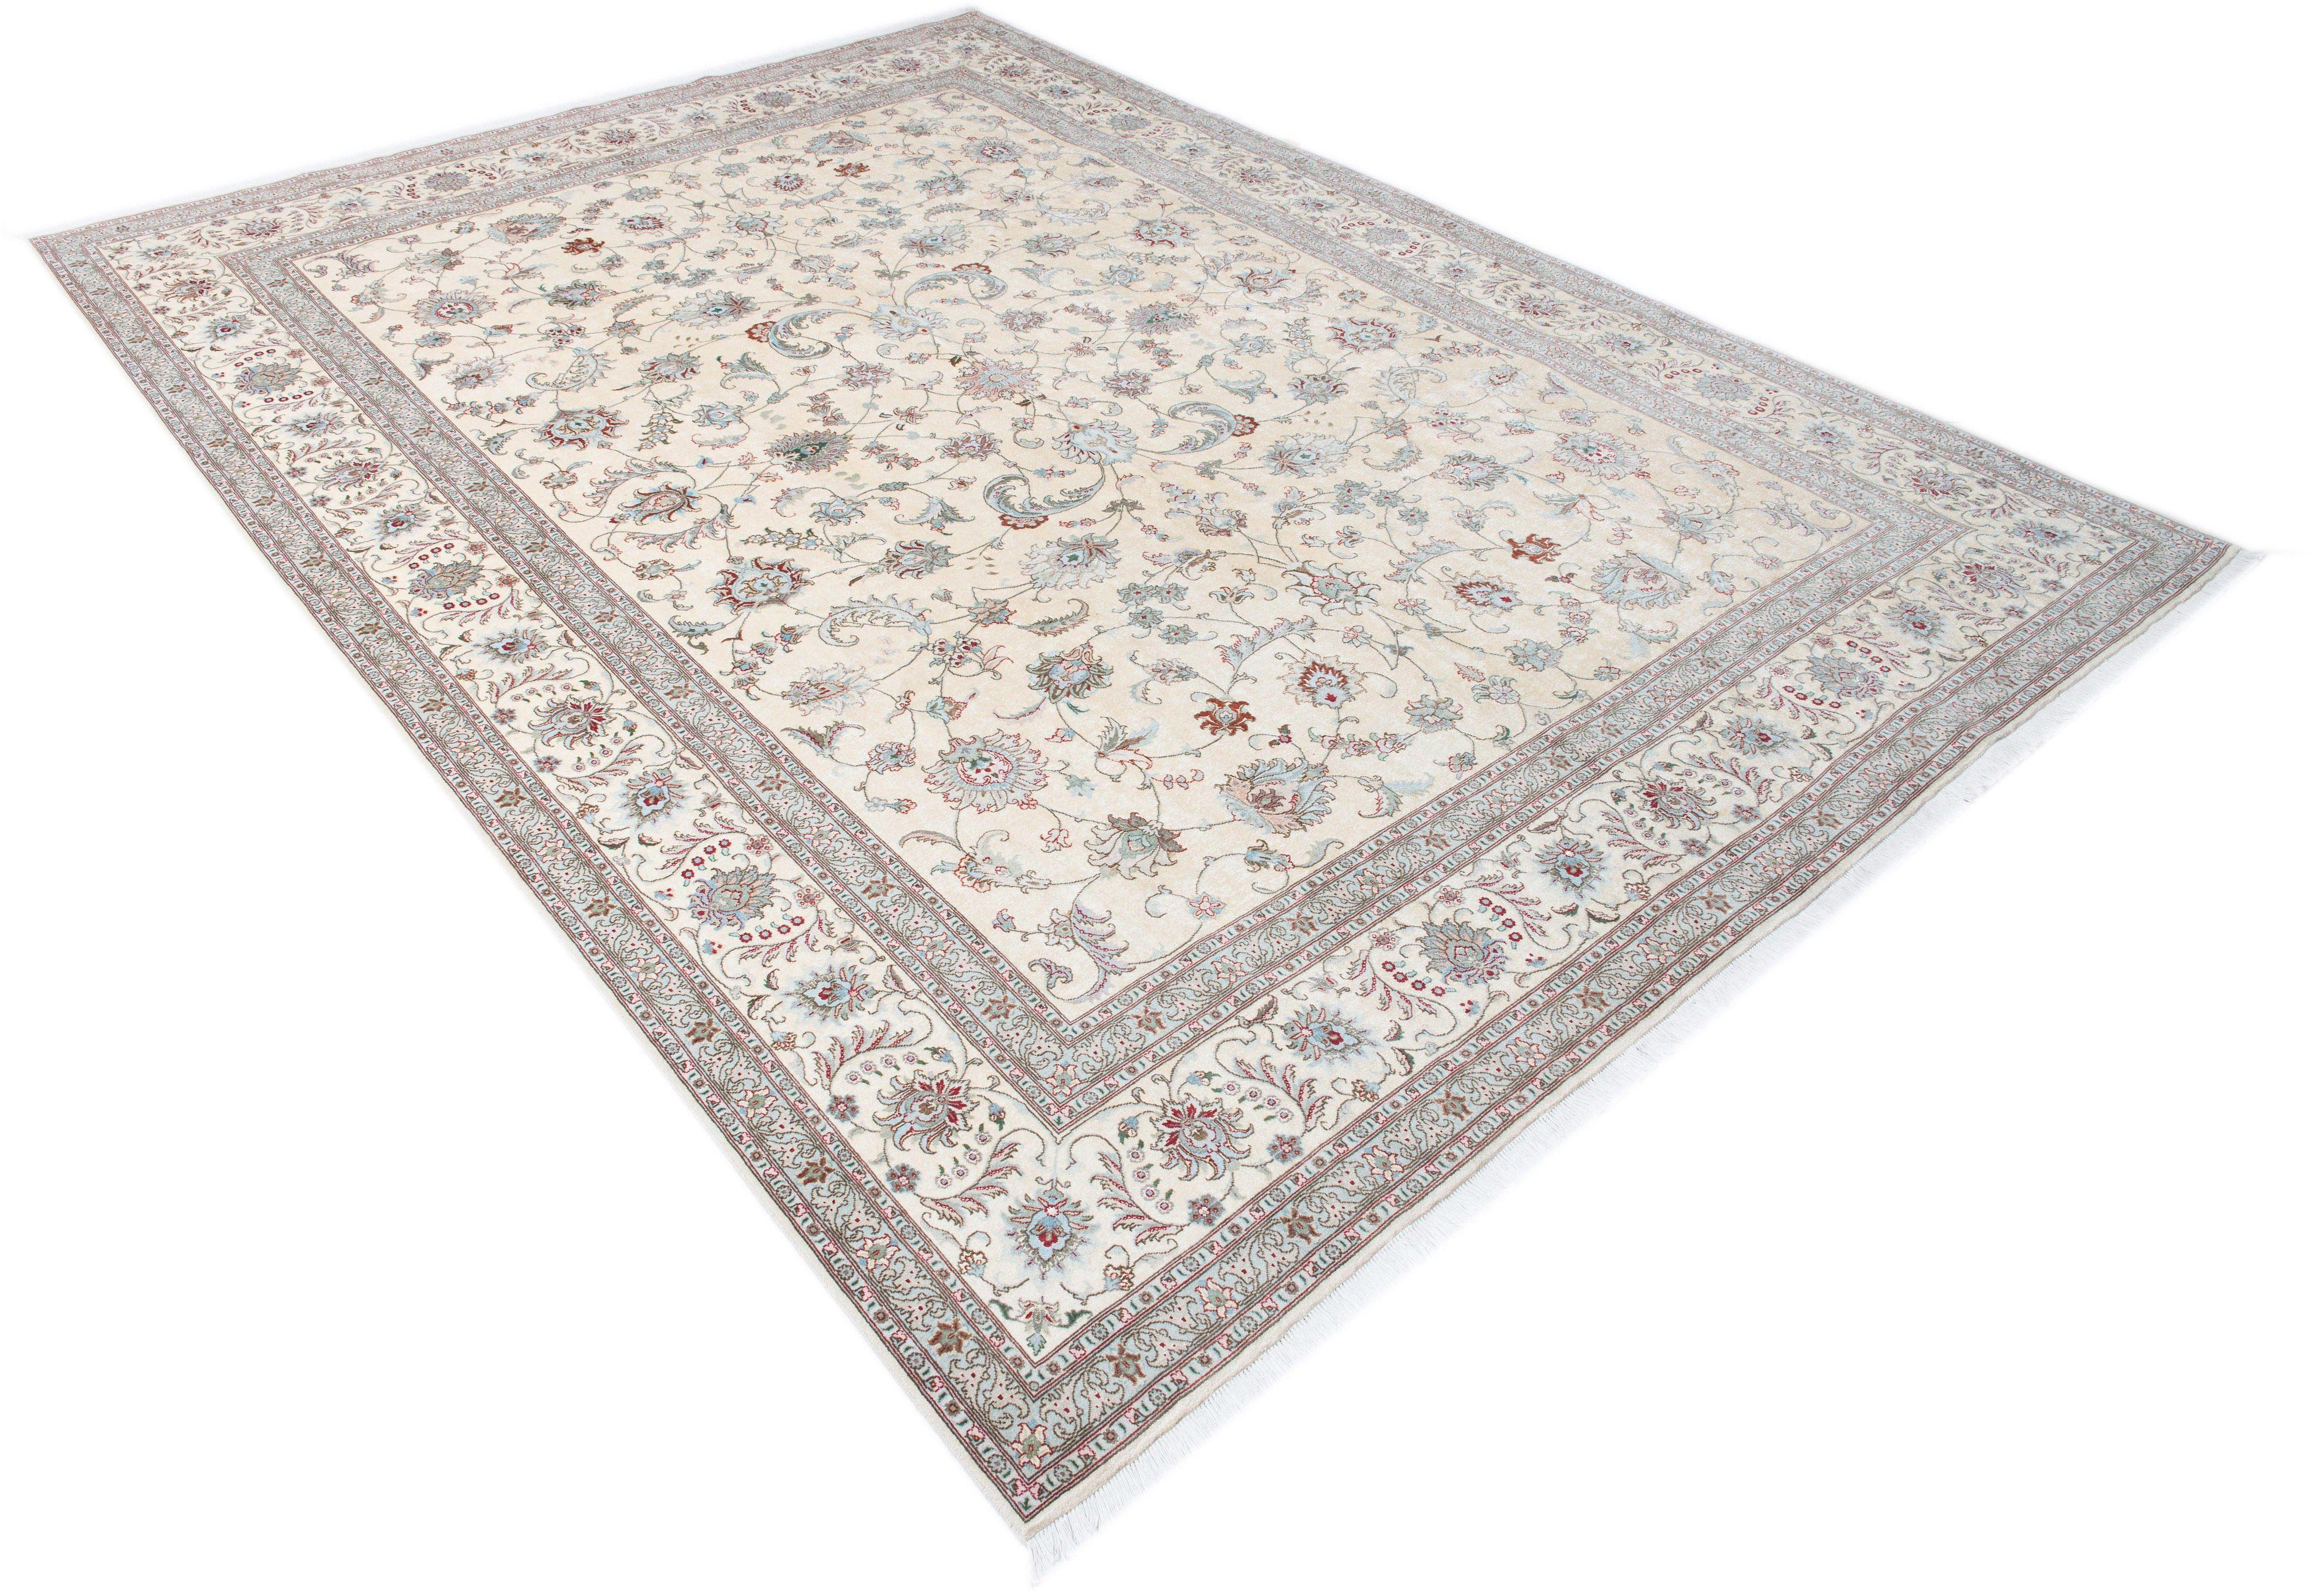 Orient-Teppich, Parwis, »Tabris Faraji«, handgeknüpft, Wolle, 700.000 Knoten/m², Unikat